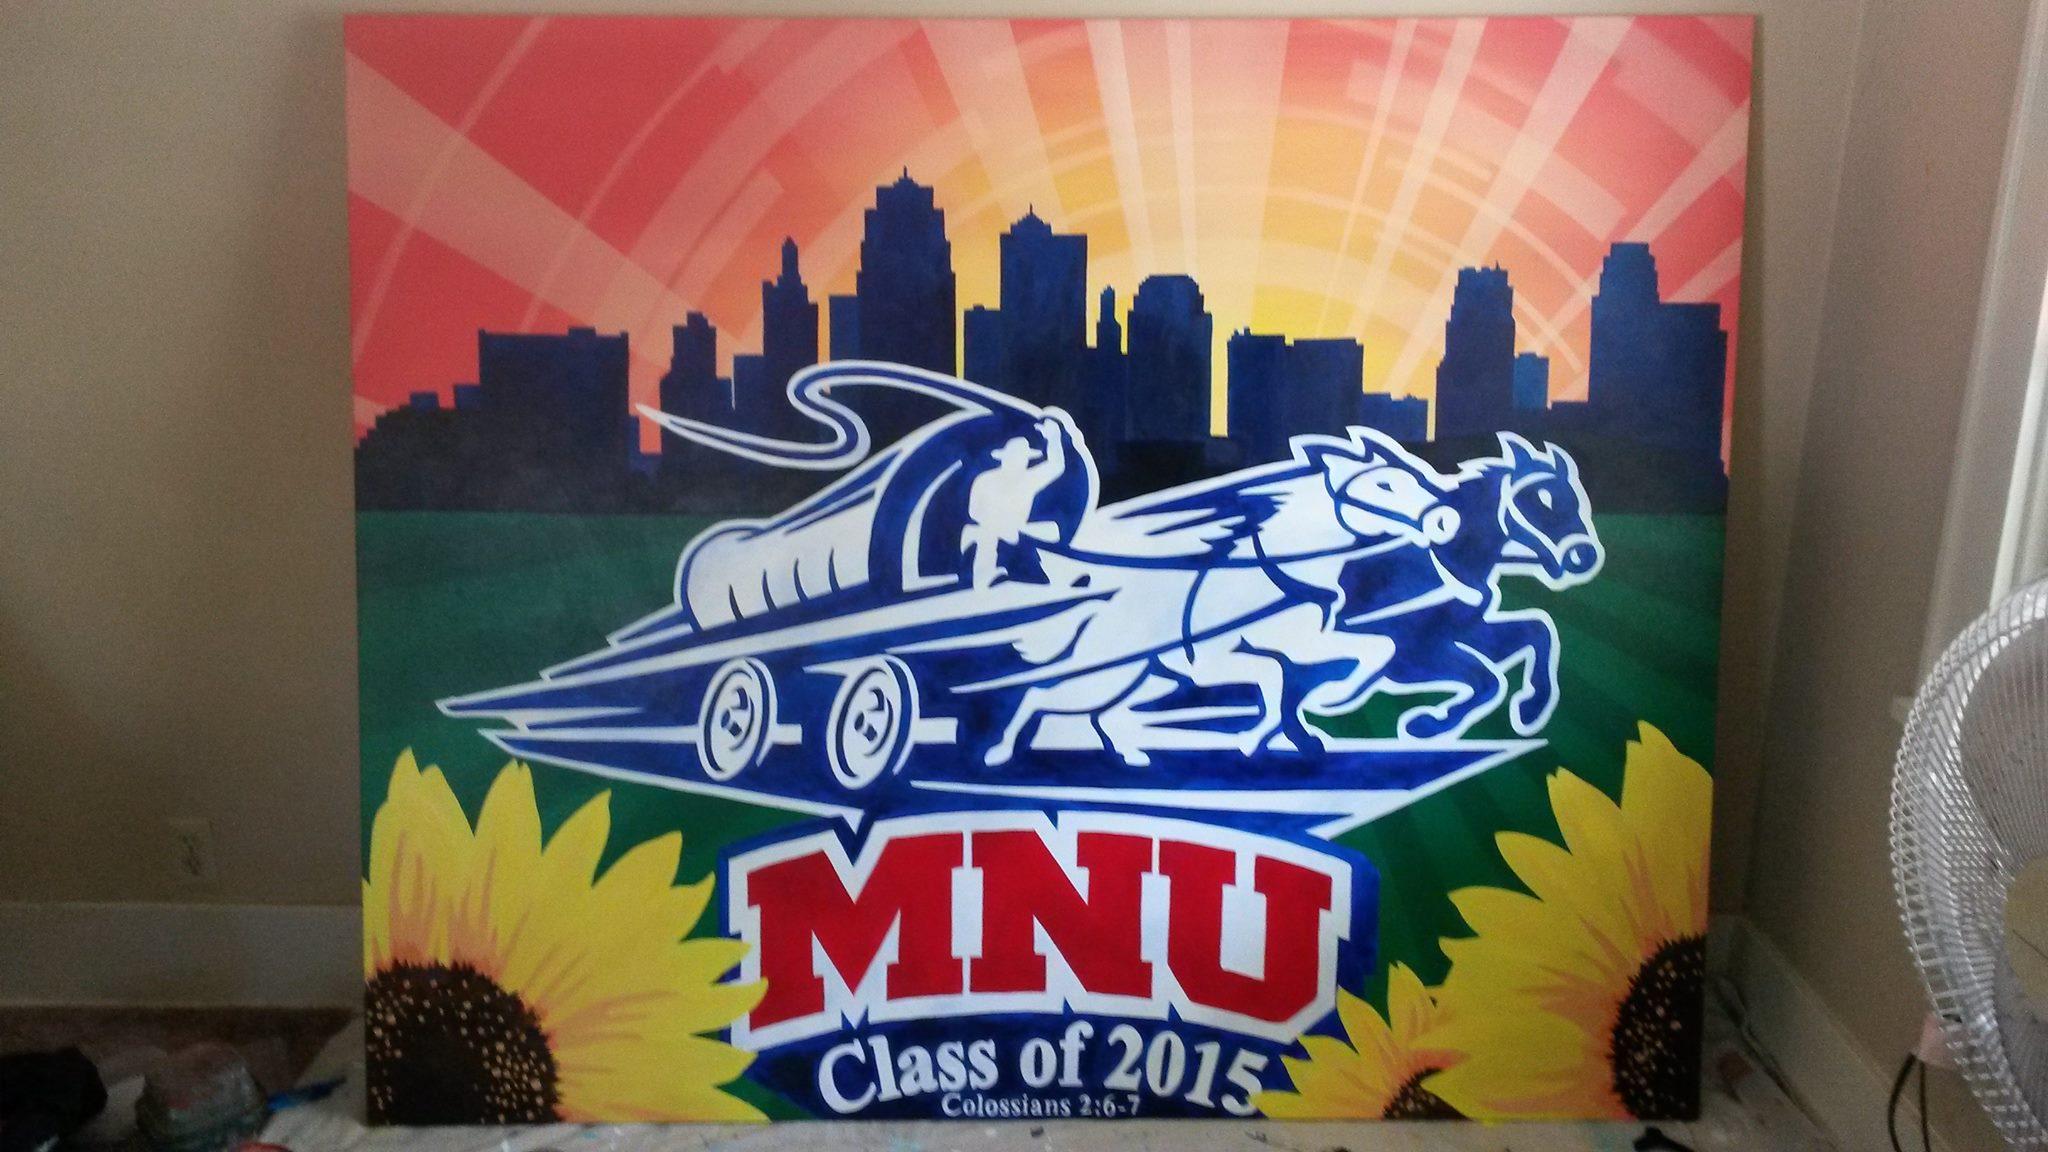 MNU Class of 2015